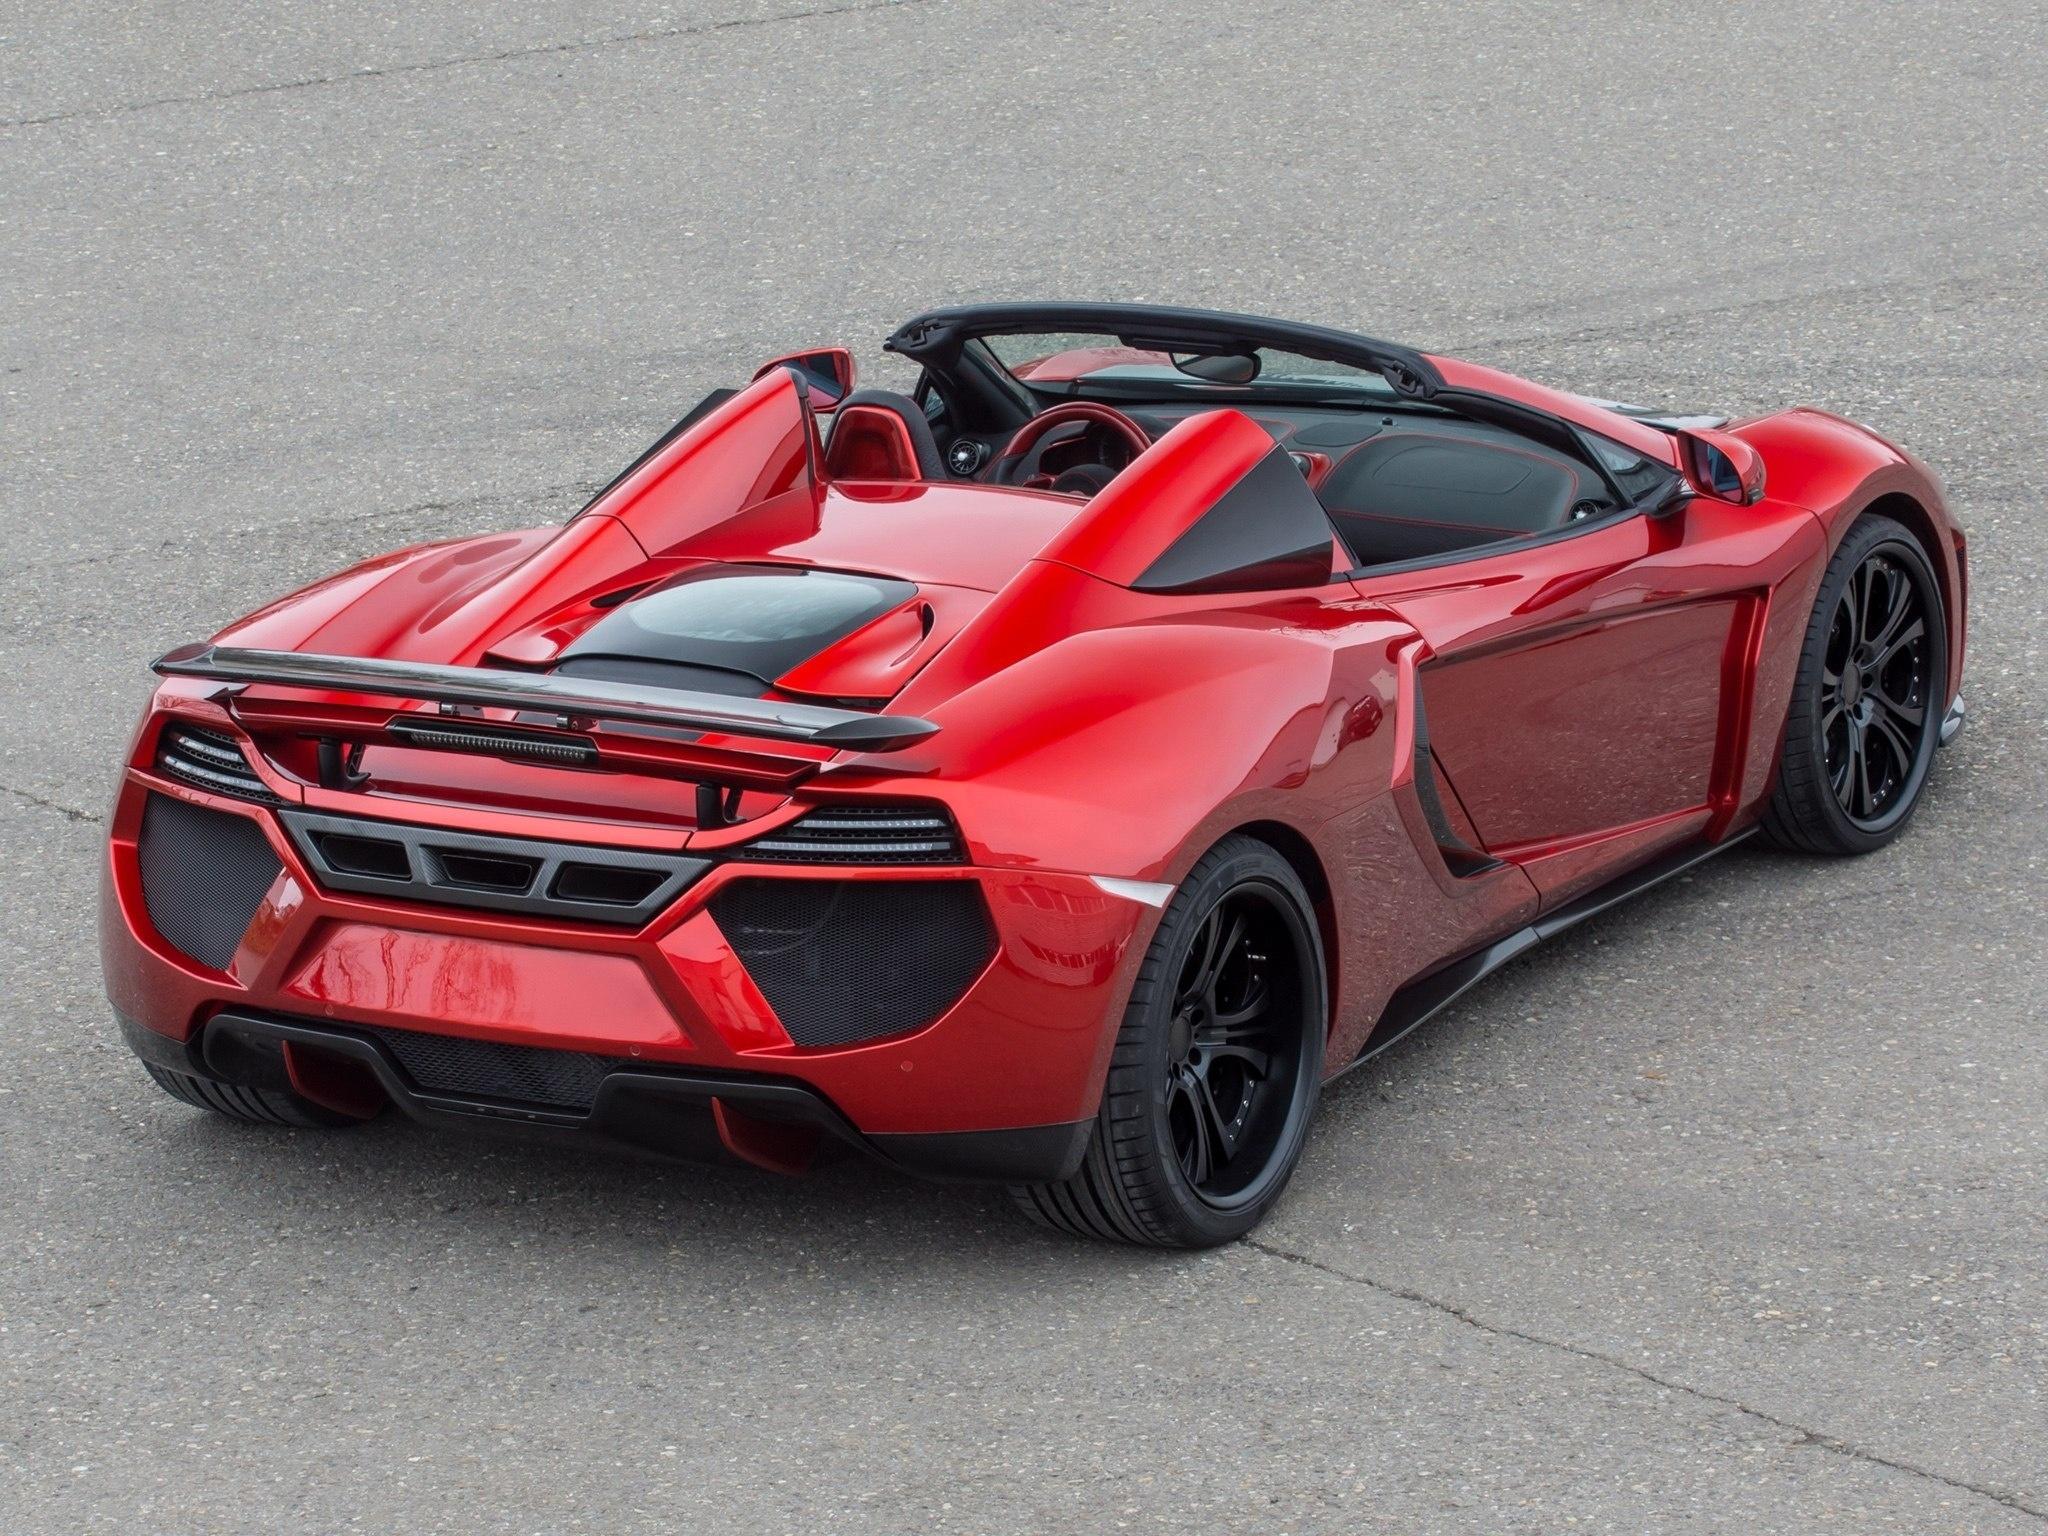 Wallpaper : McLaren, auto, car, cars, machinery 2048x1536 ...